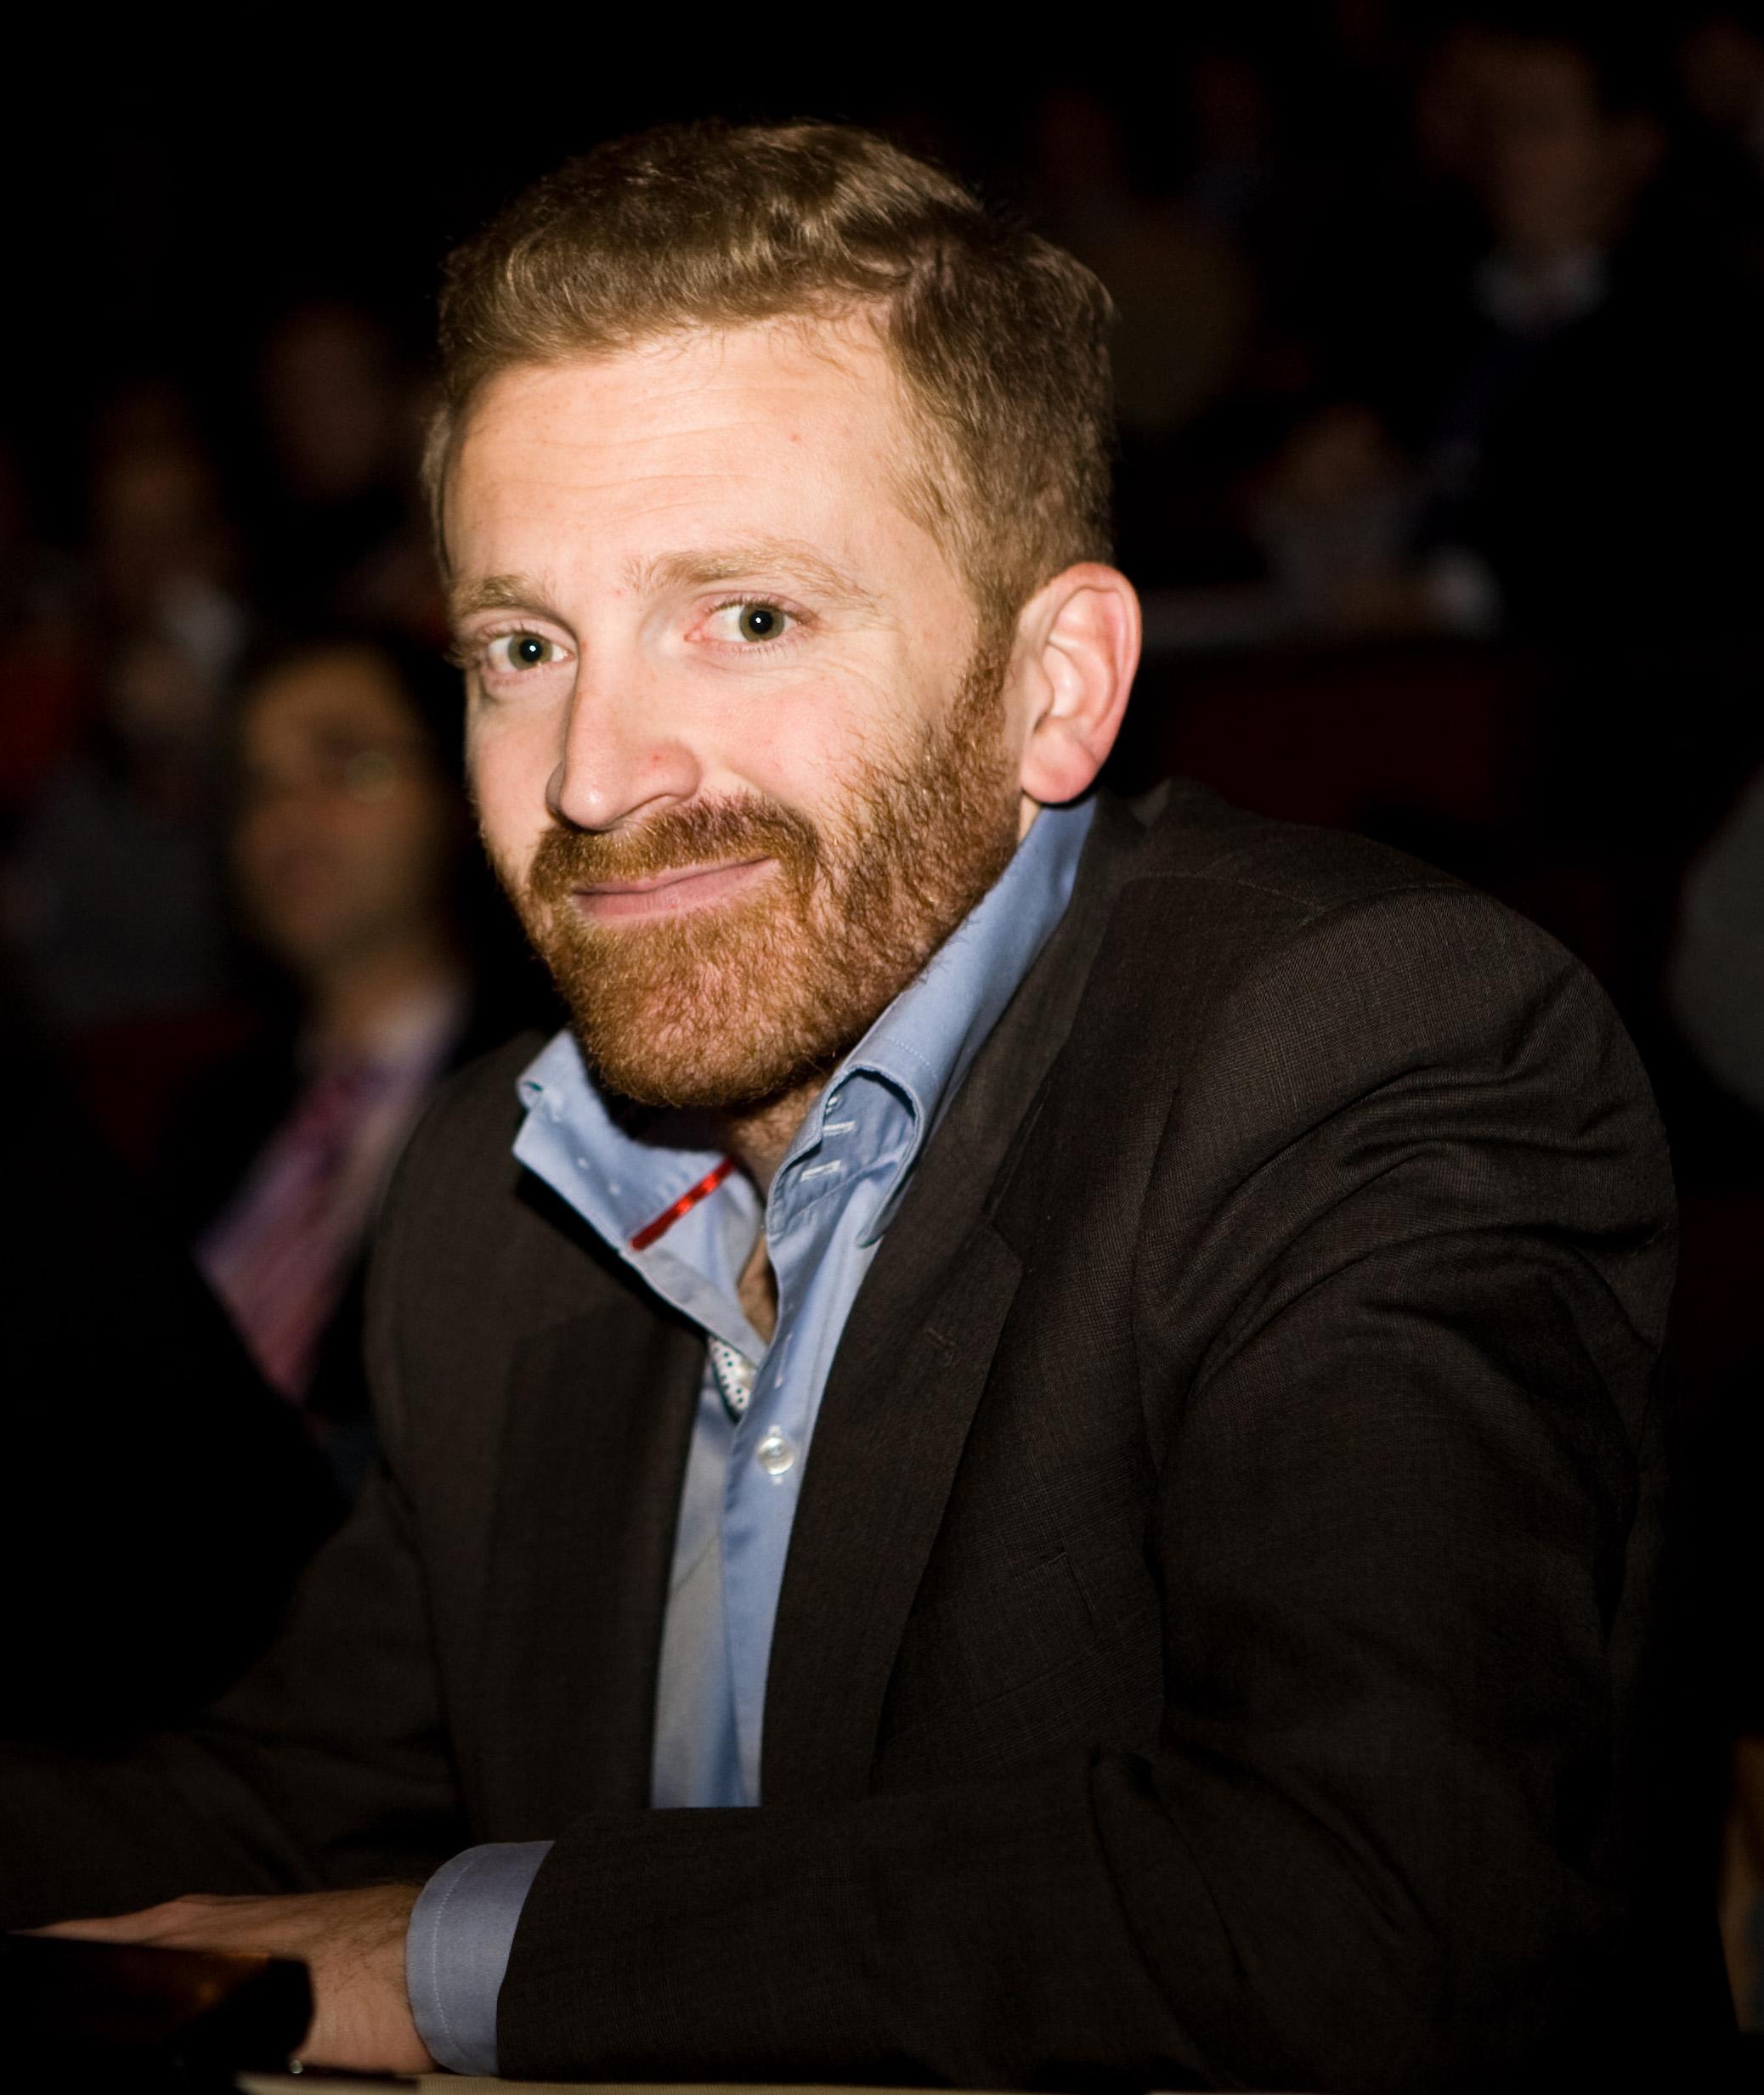 Pierre Kosciusko-Morizet en 2008 (Raphael Labbé - Wikipédia - CC by-sa)